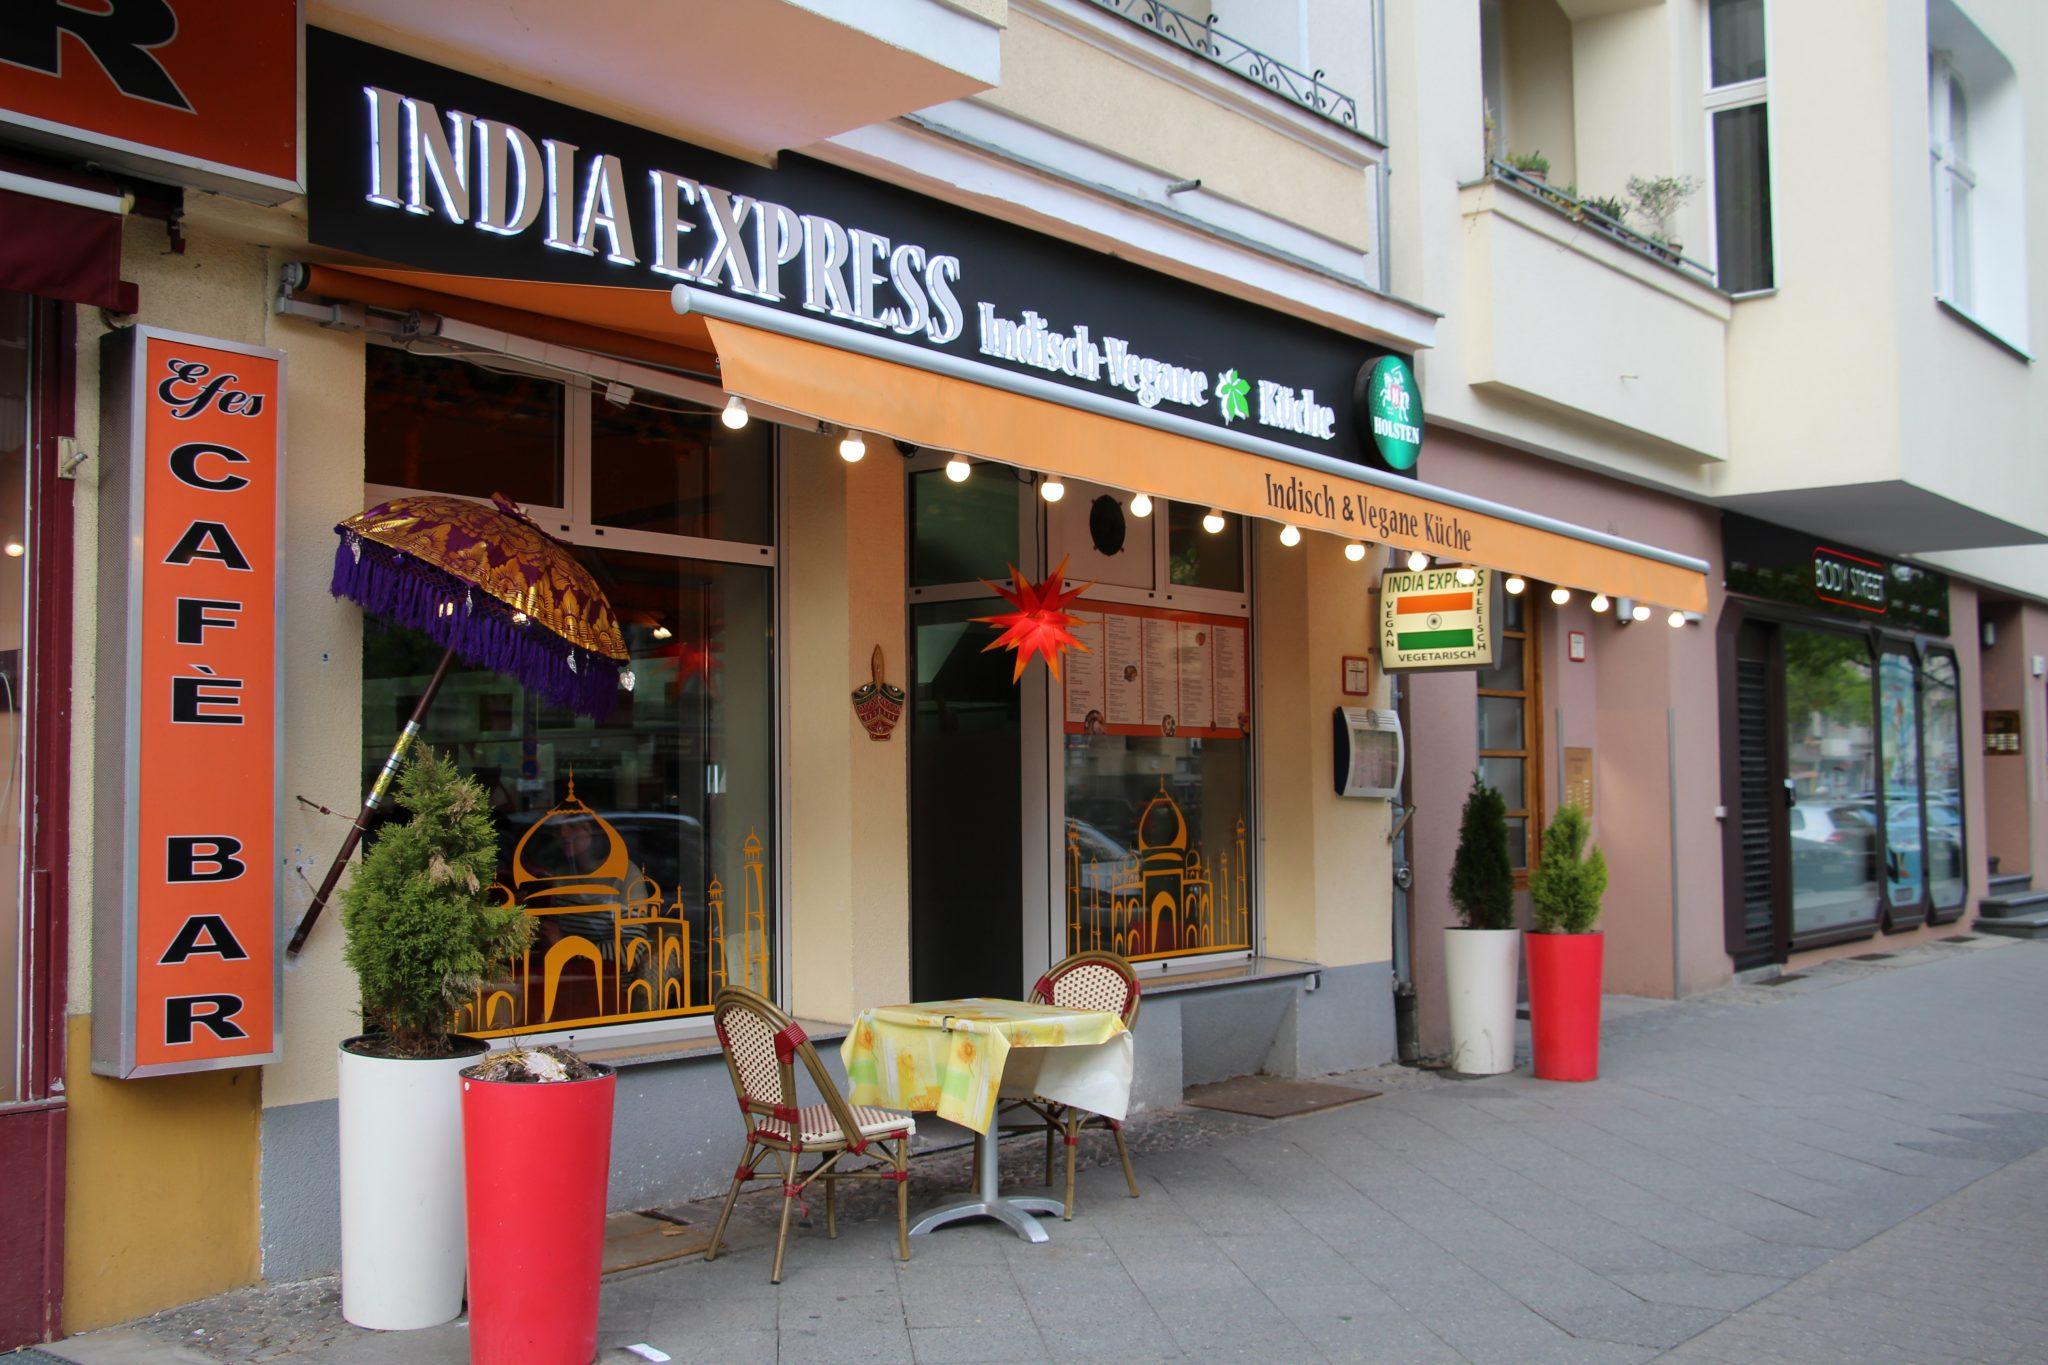 indische essen im berlin kantstra e 74 10627 berlin germany. Black Bedroom Furniture Sets. Home Design Ideas